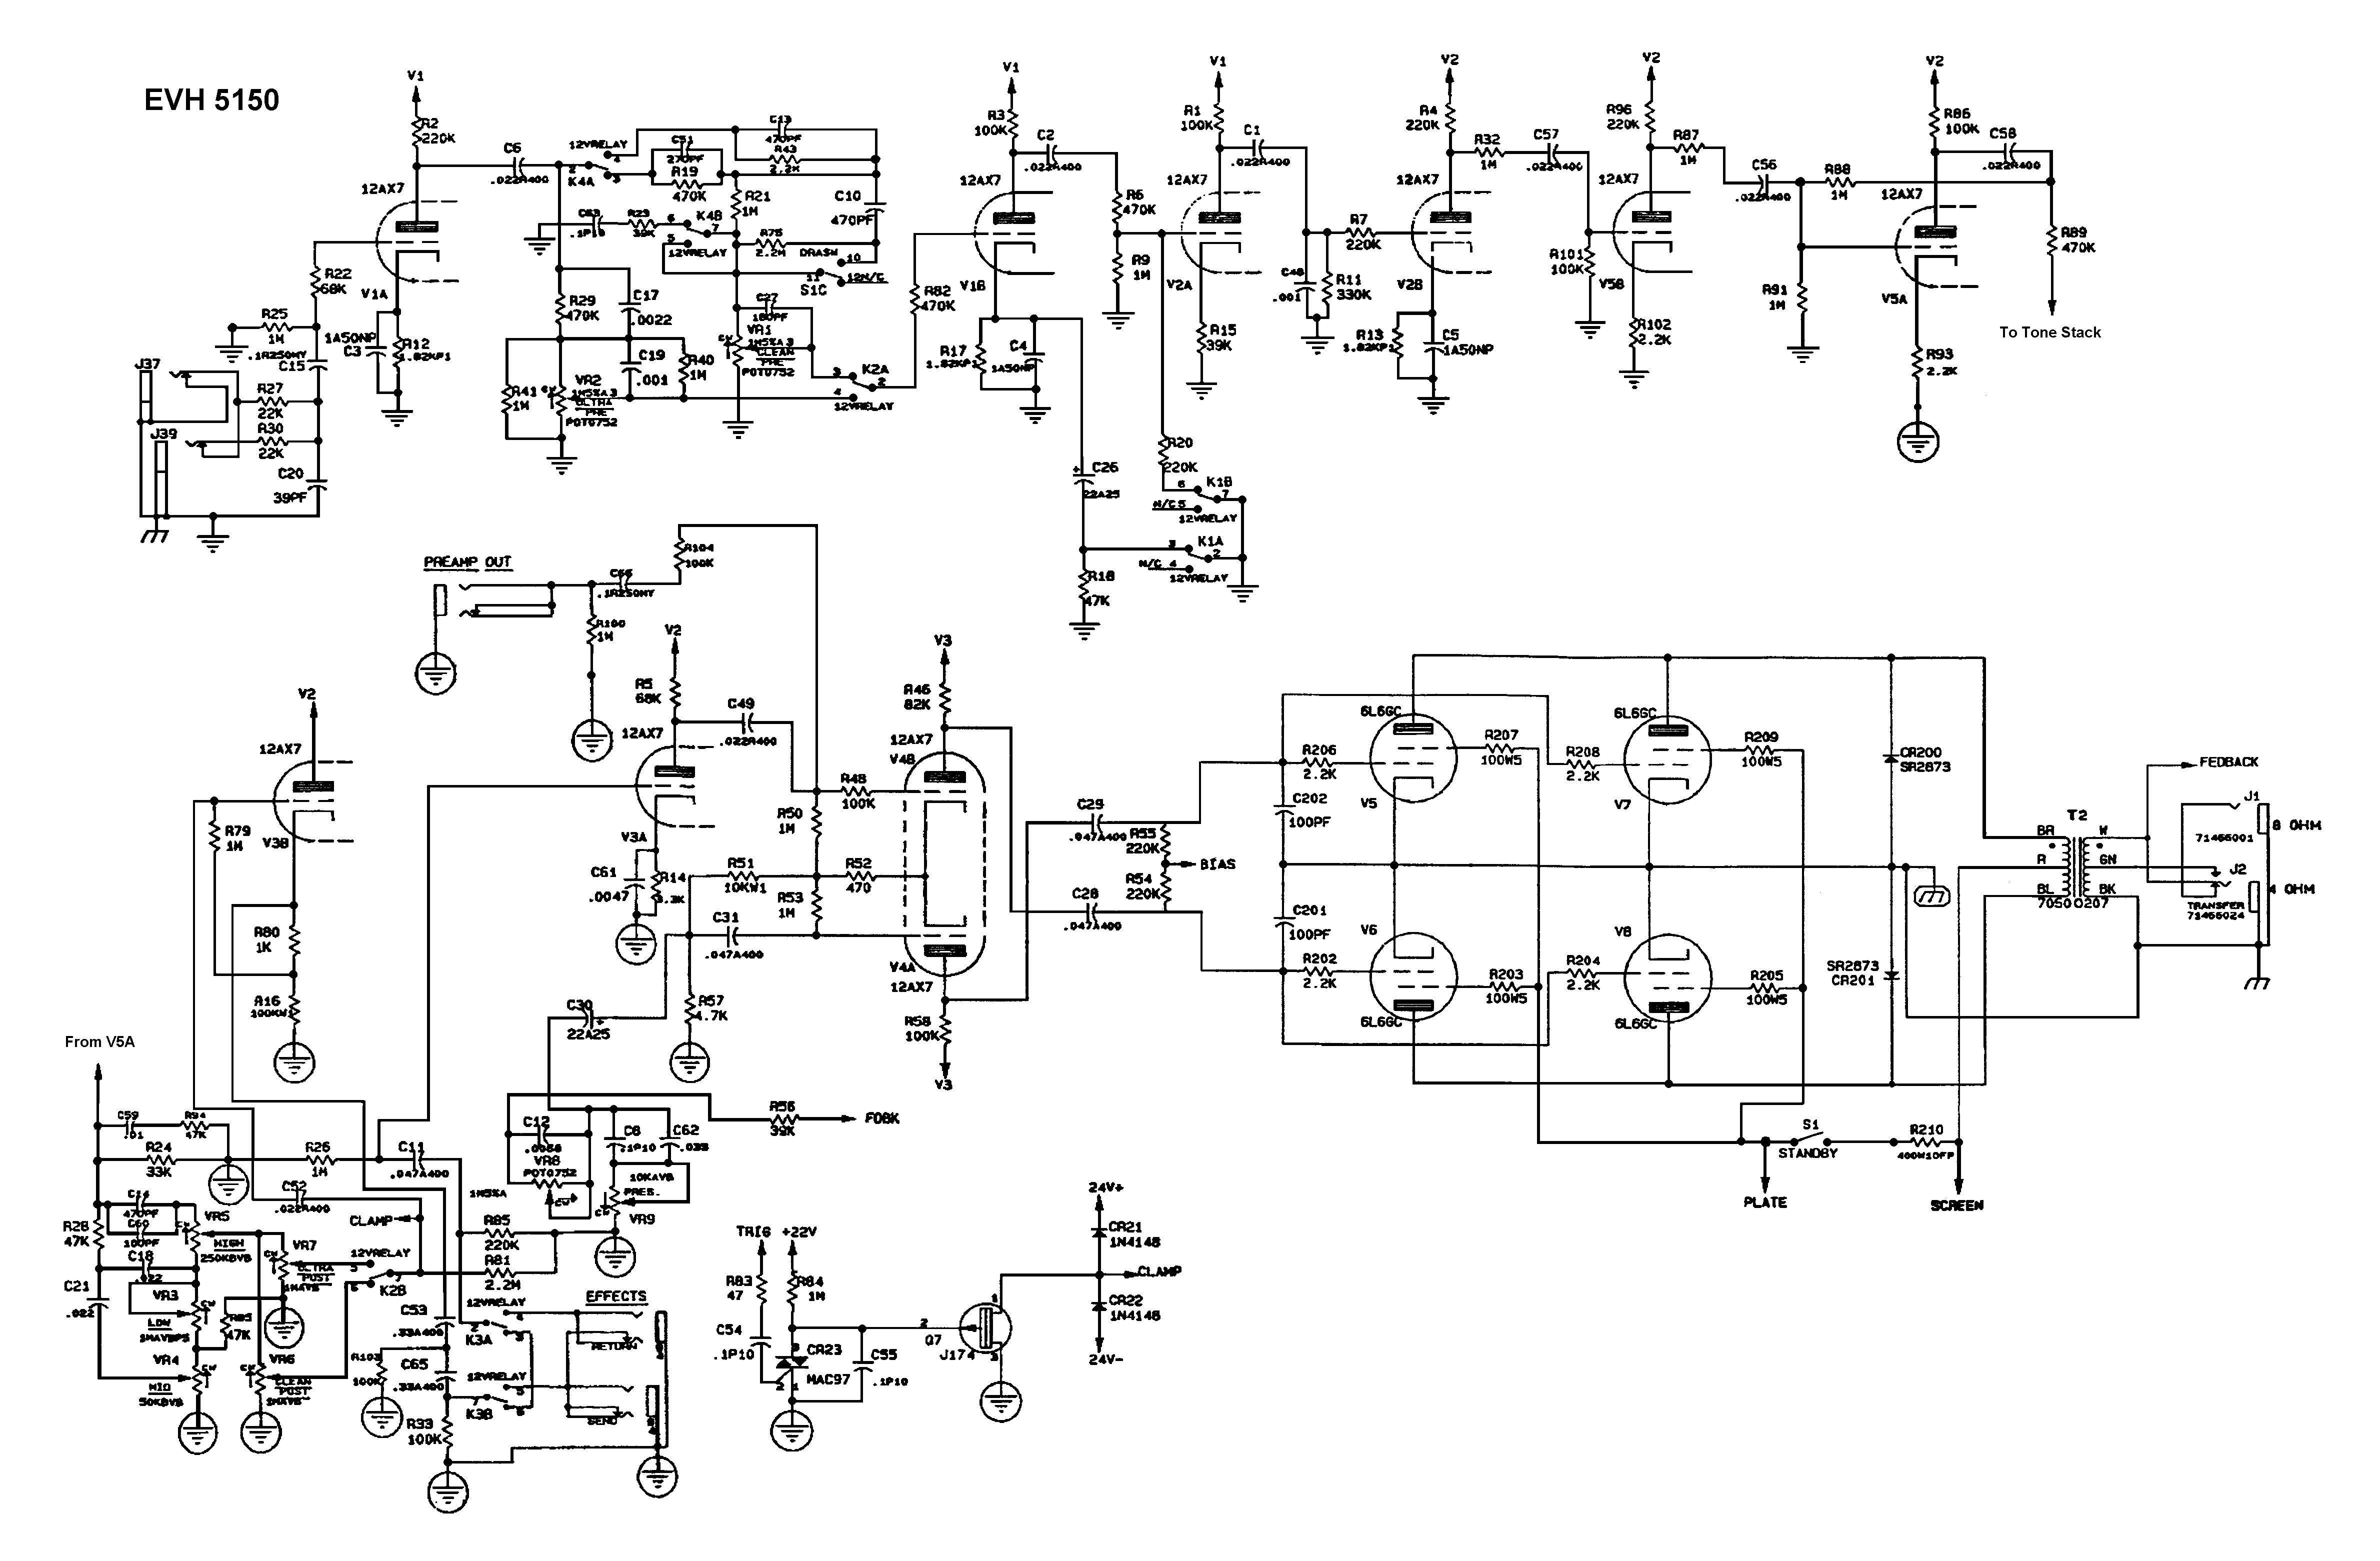 Wiring Diagram for Peavey Guitar Fresh Peavey T 60 Wiring Diagram Wiring Diagram